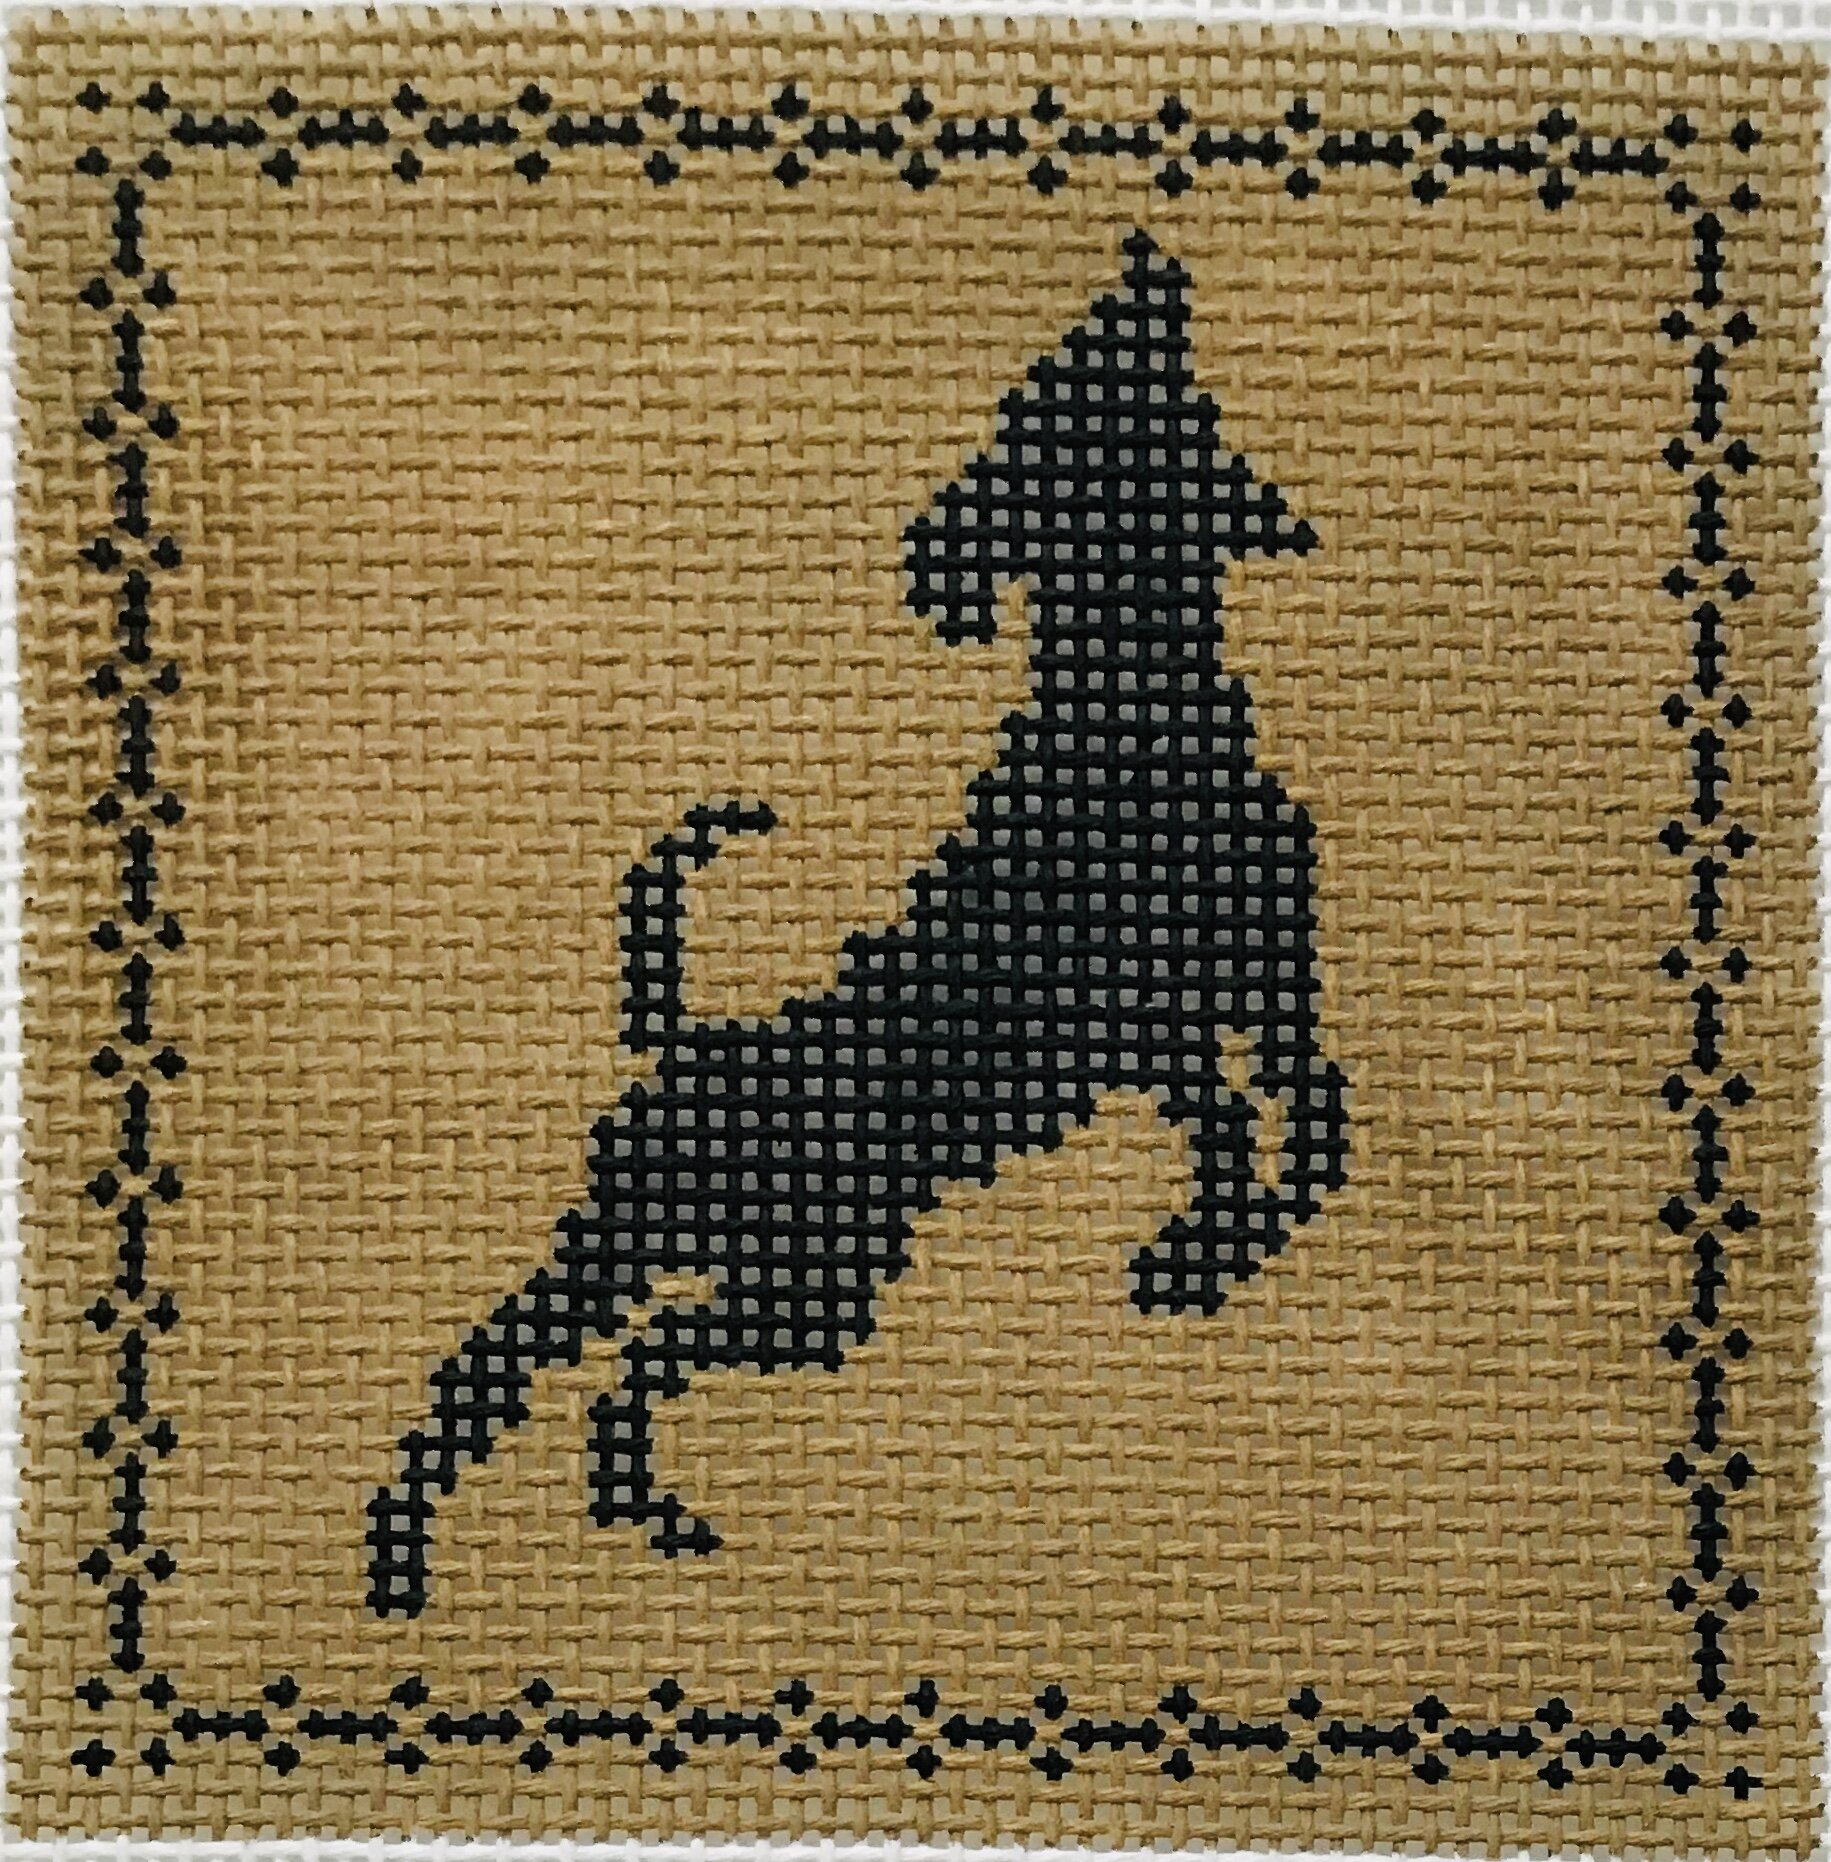 "Jumping Labrador AL130   4"" x 4"" on 14 mesh"